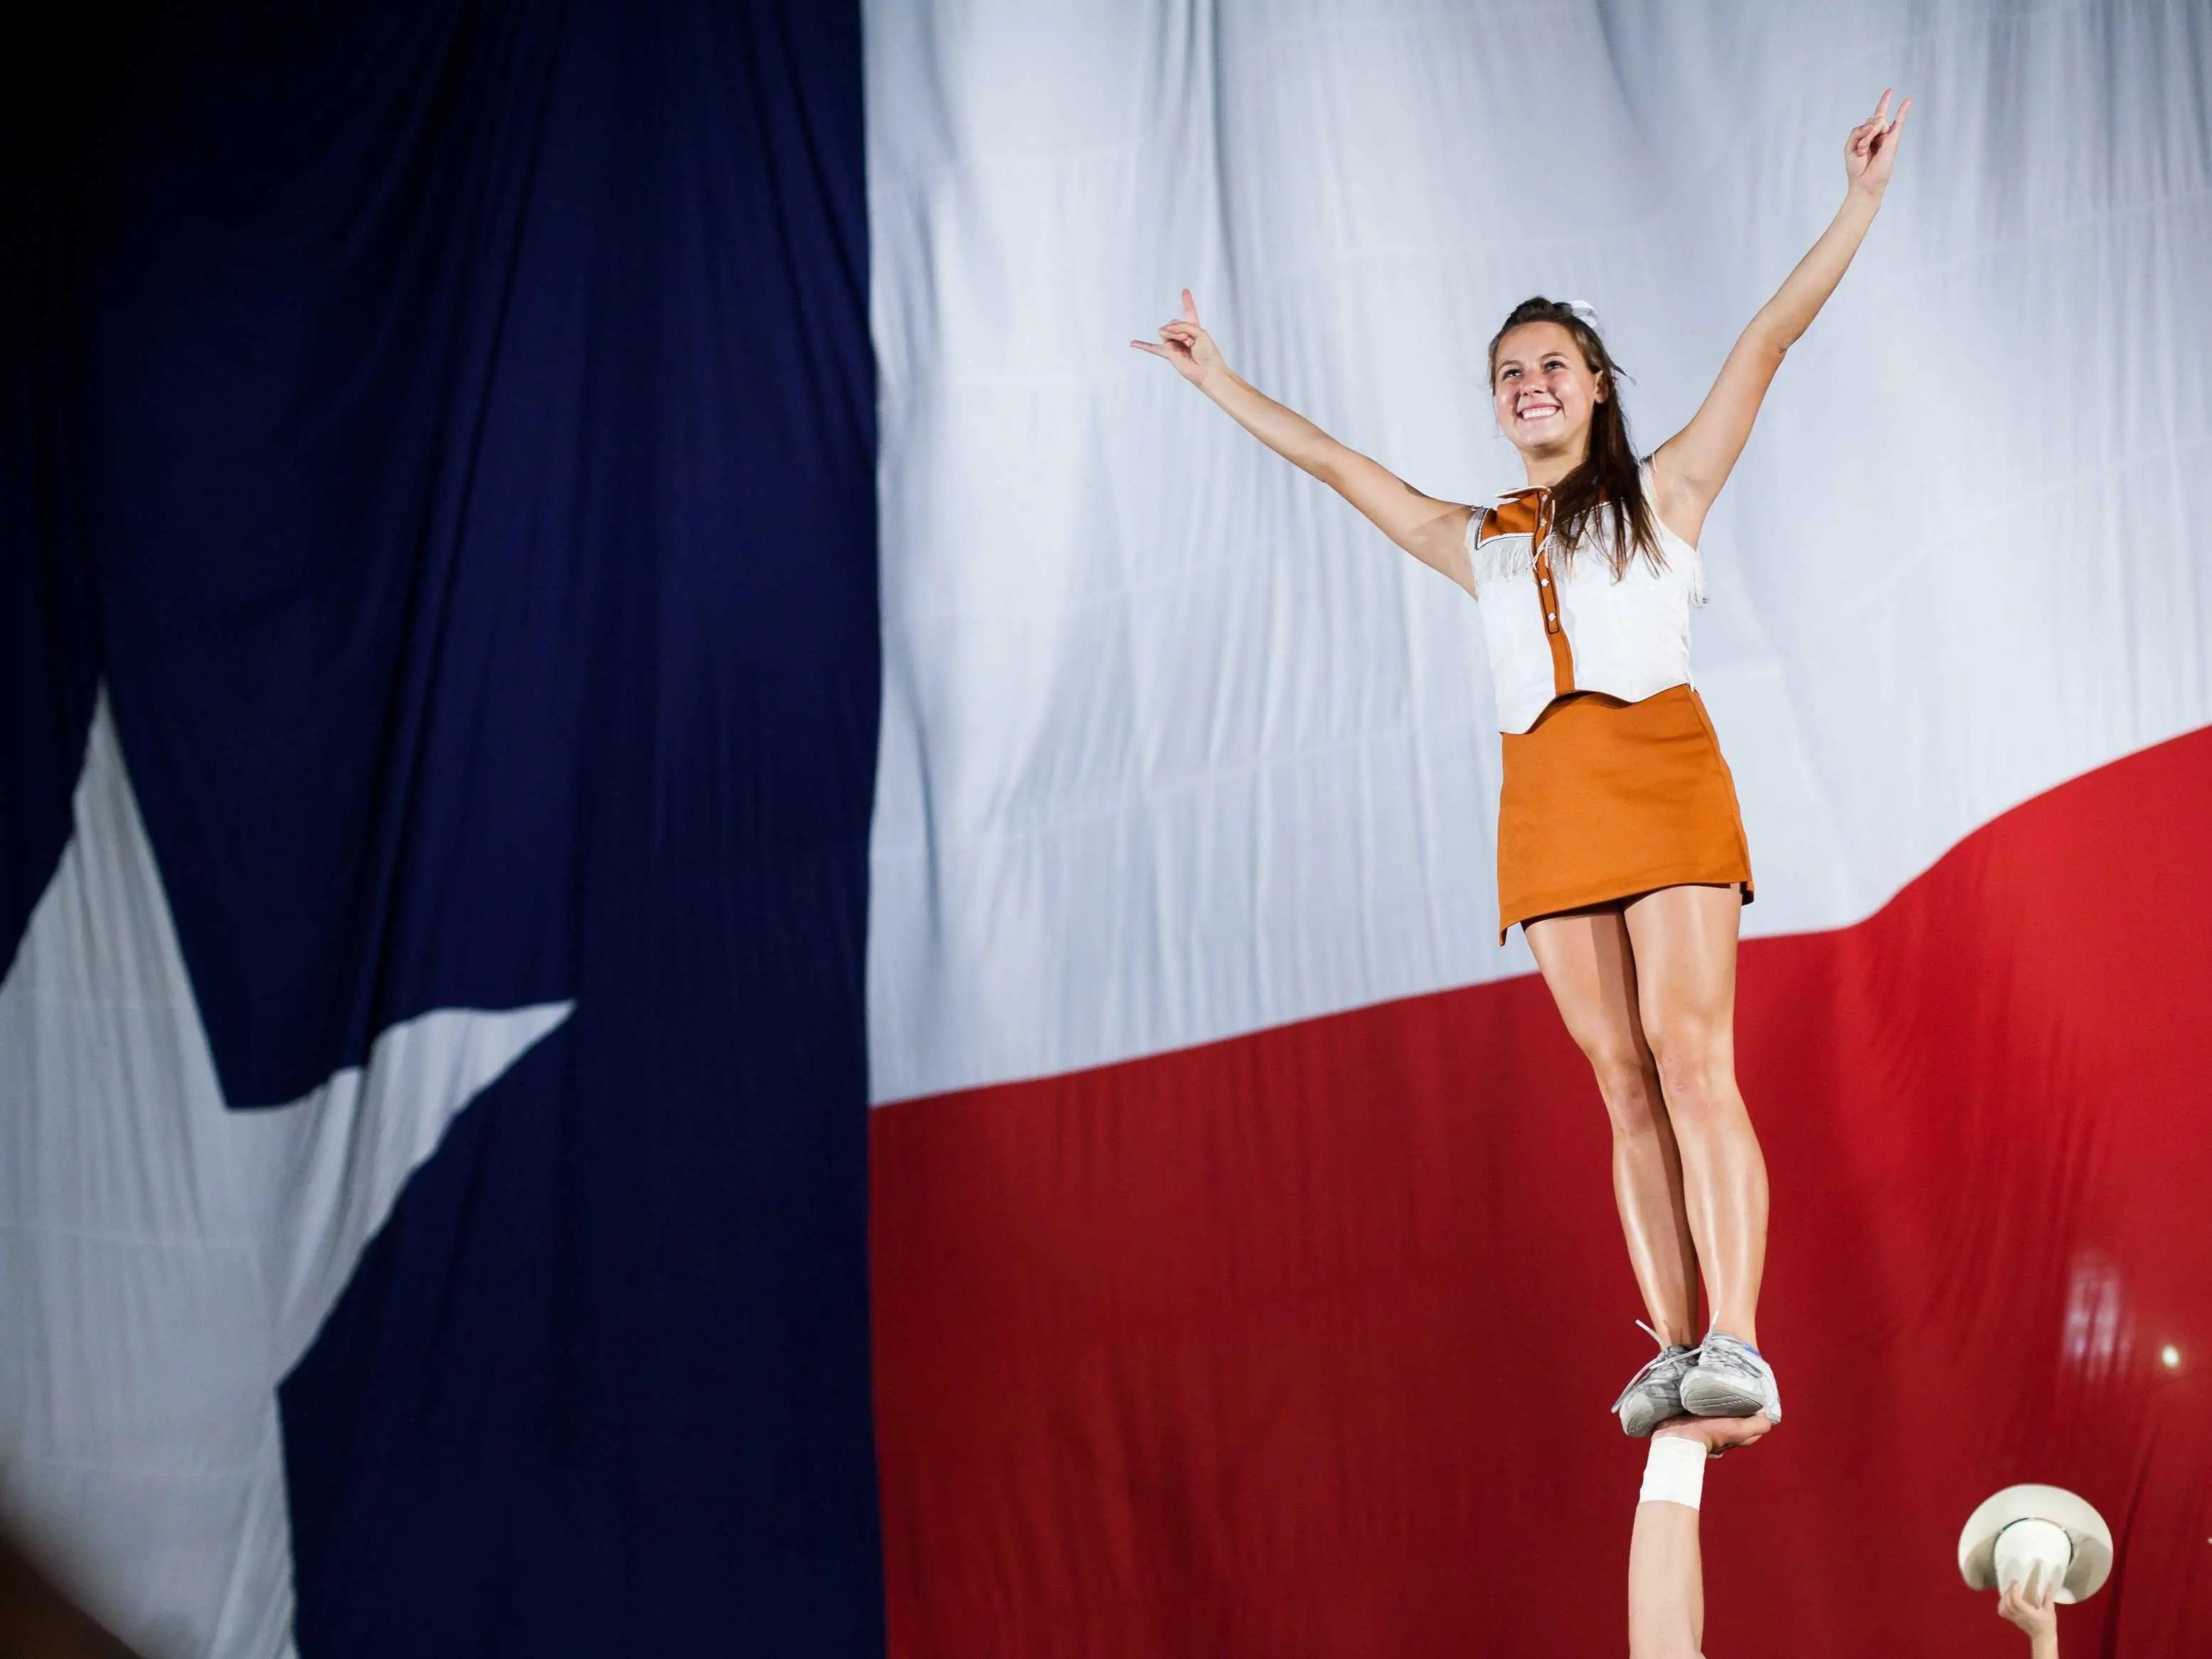 41 (TIE). University of Texas at Austin